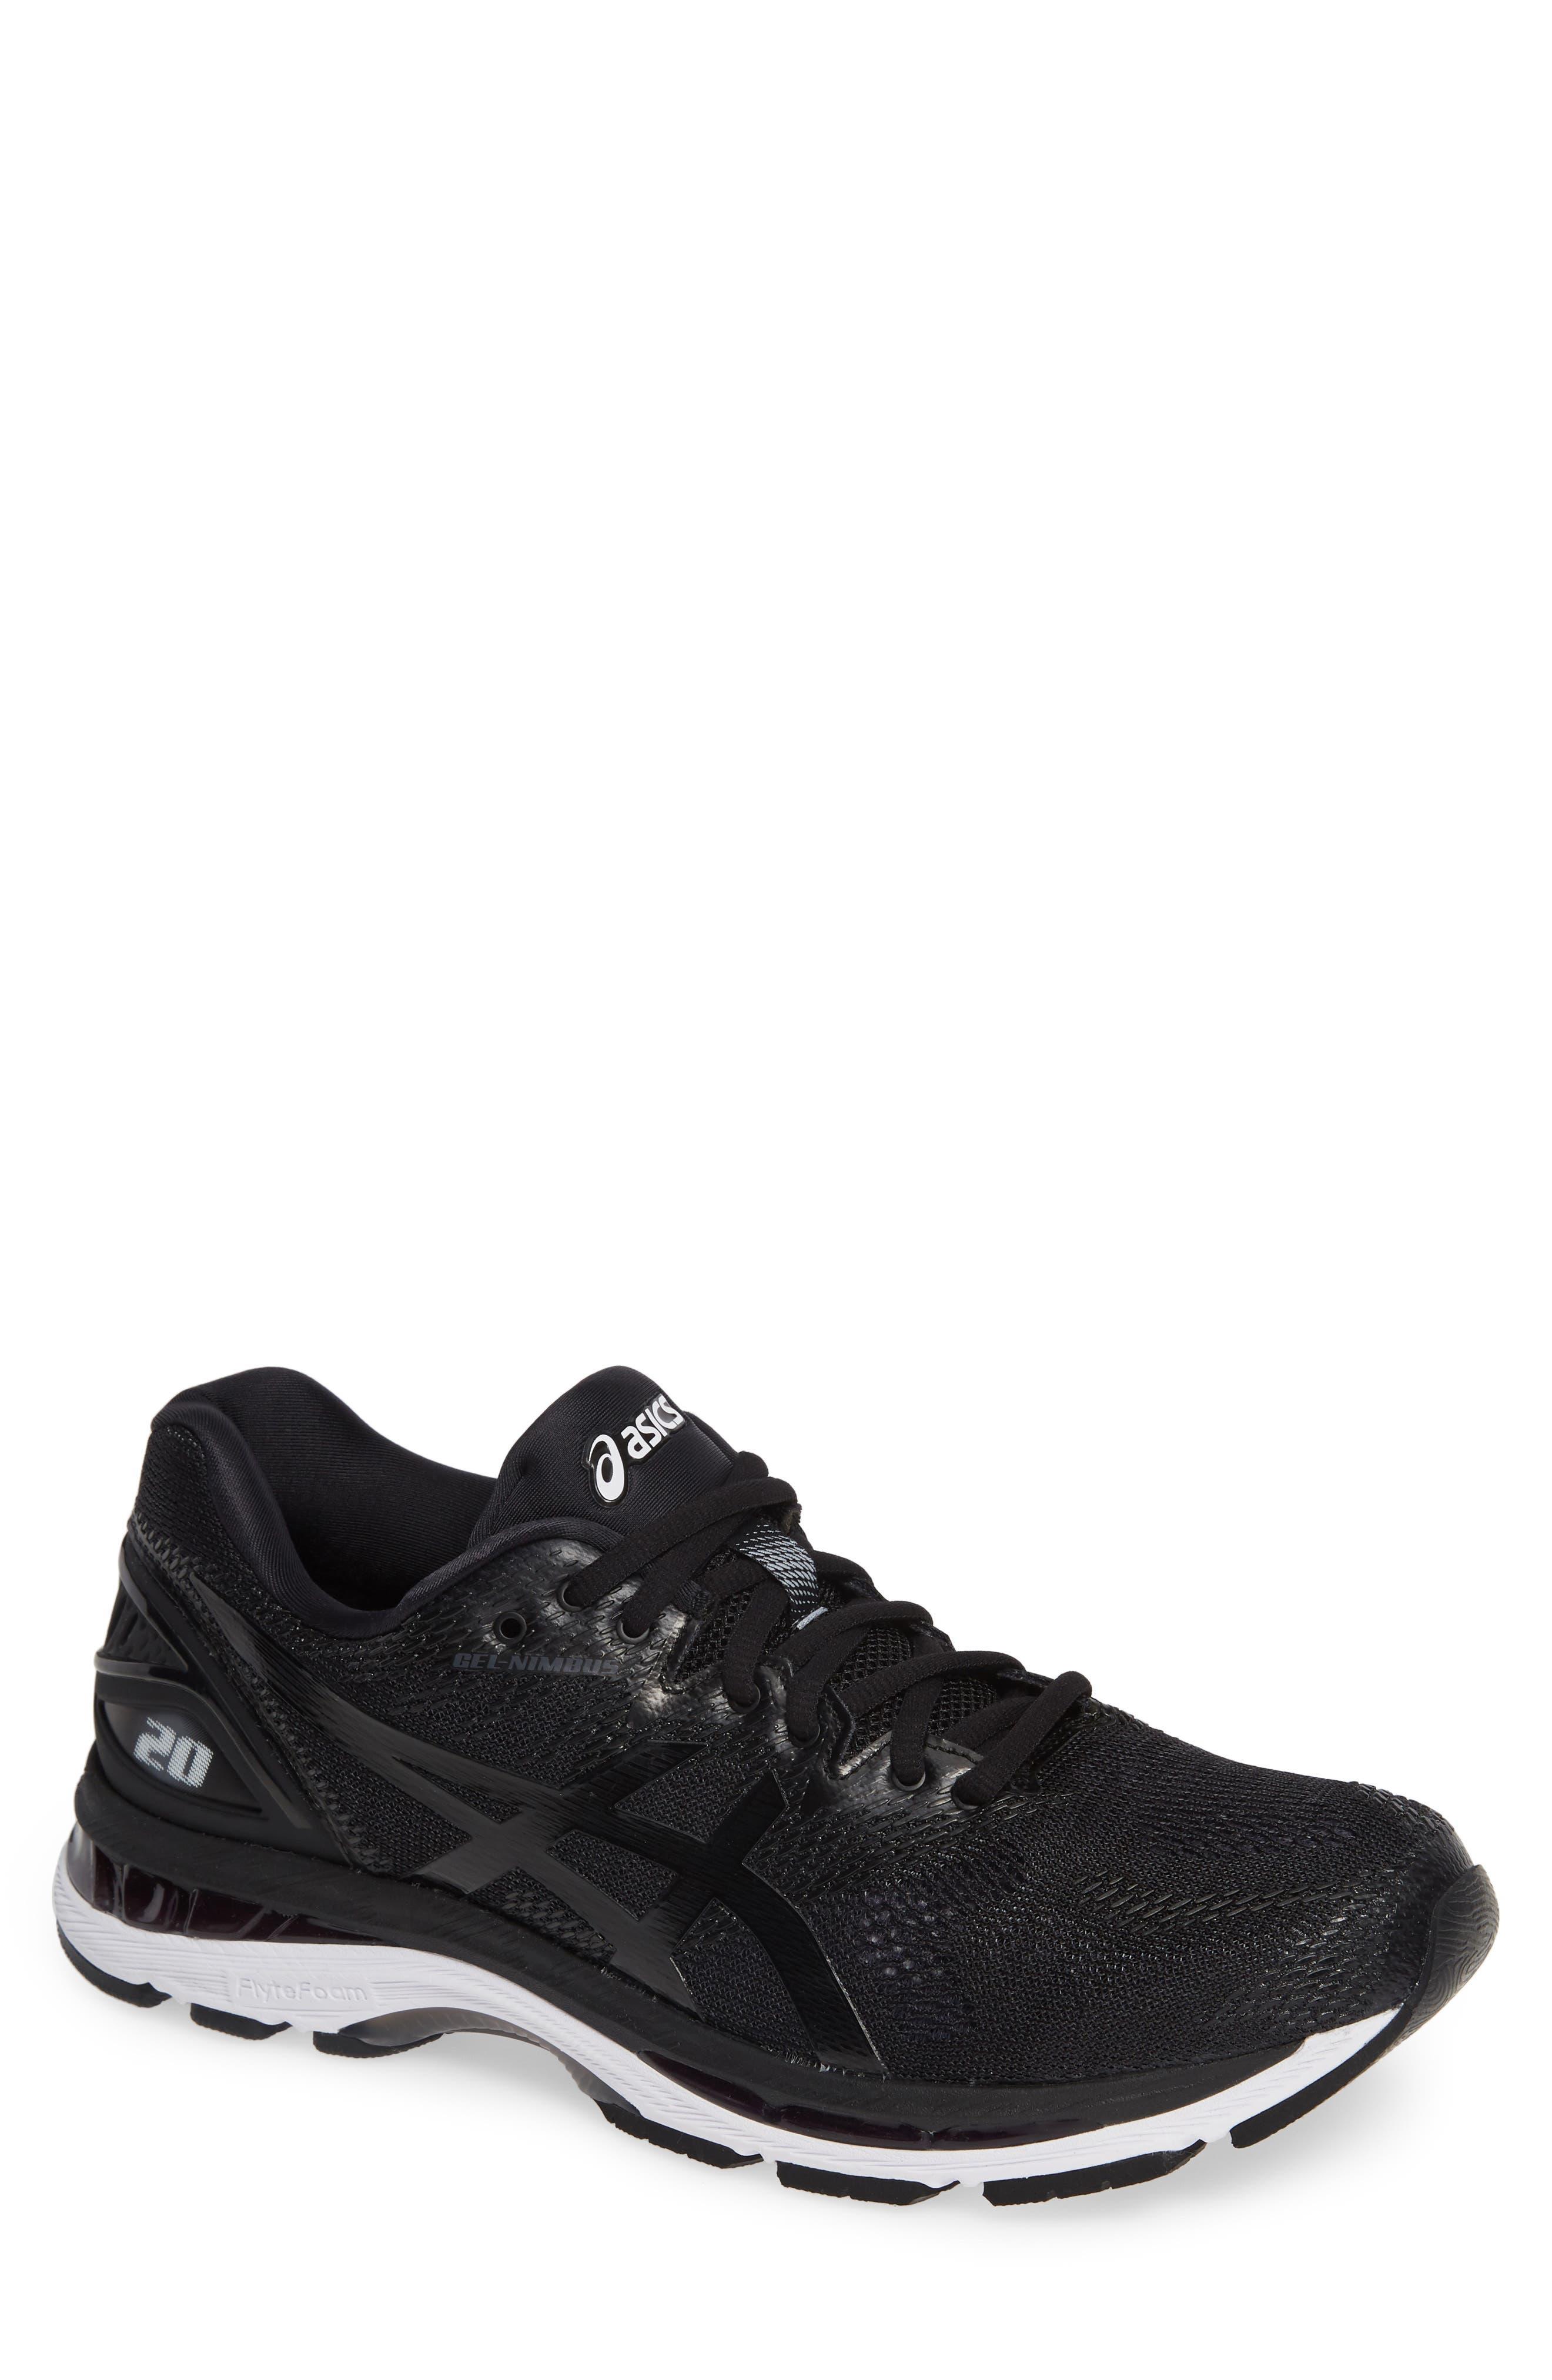 GEL<sup>®</sup>-Nimbus 20 Running Shoe,                         Main,                         color, BLACK/ WHITE/ CARBON